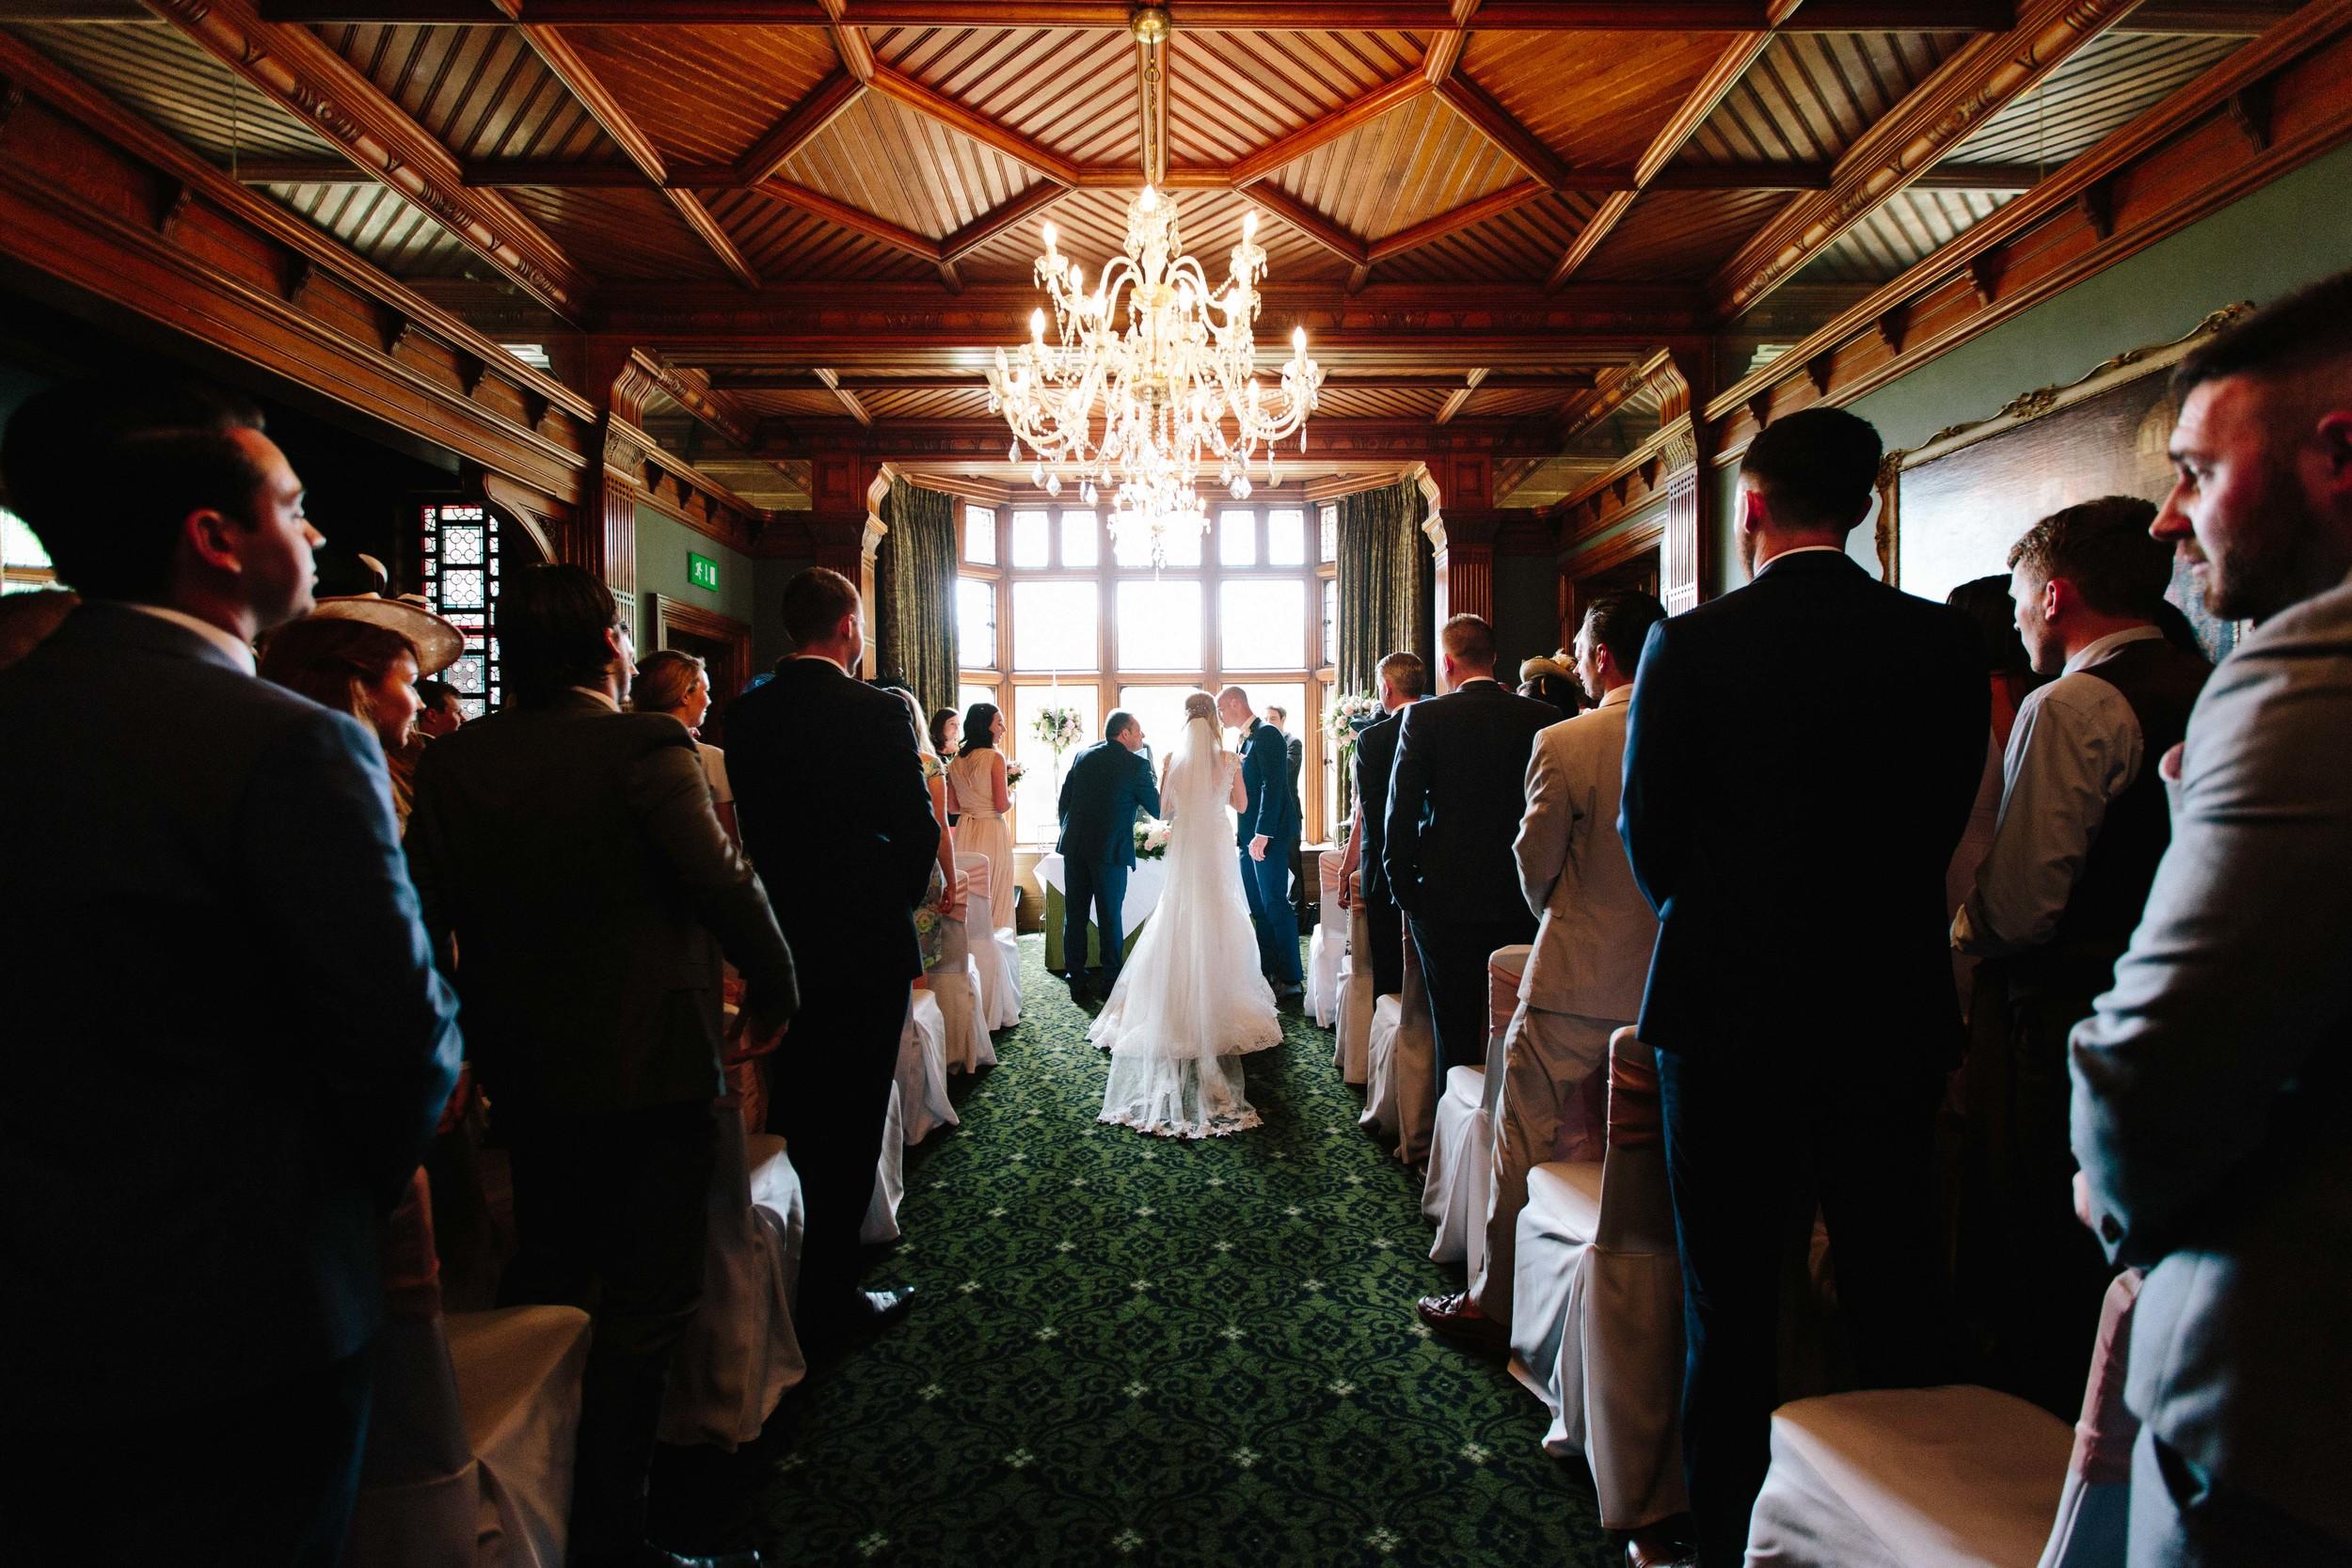 Woodlands-Park-Hotel-Cobham-Surrey-wedding-15